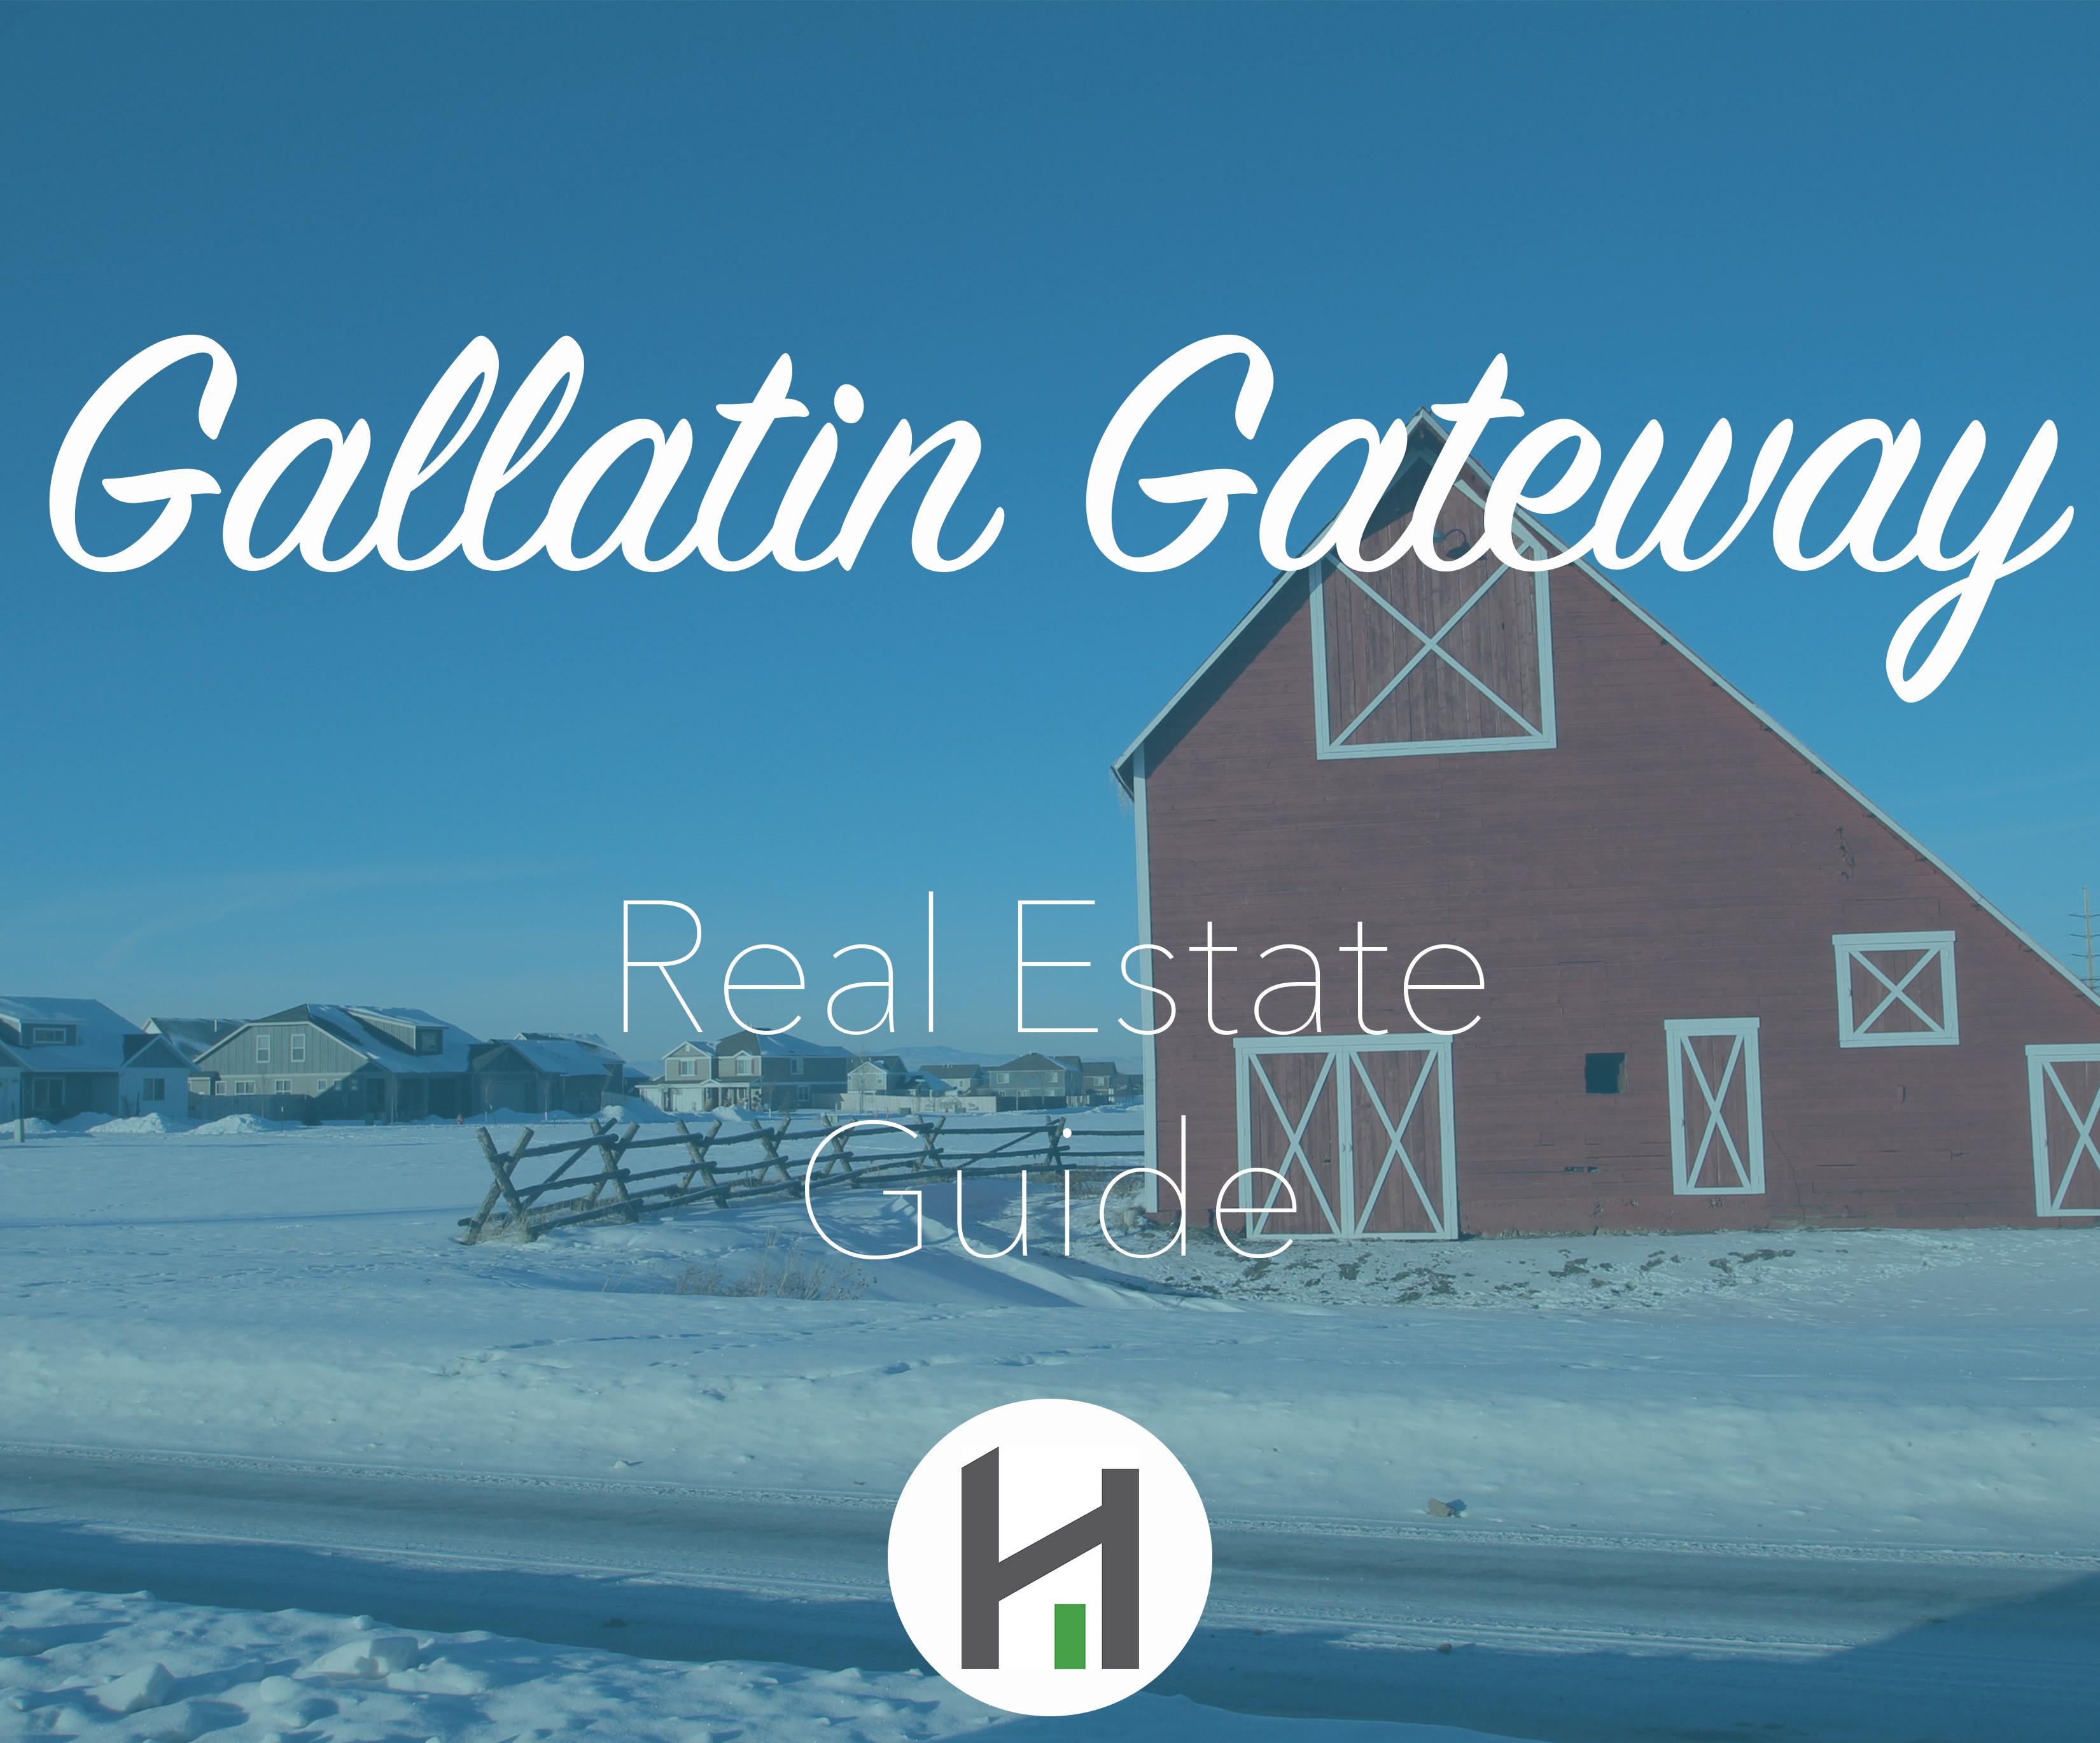 Gallatin Gateway Real Estate Guide